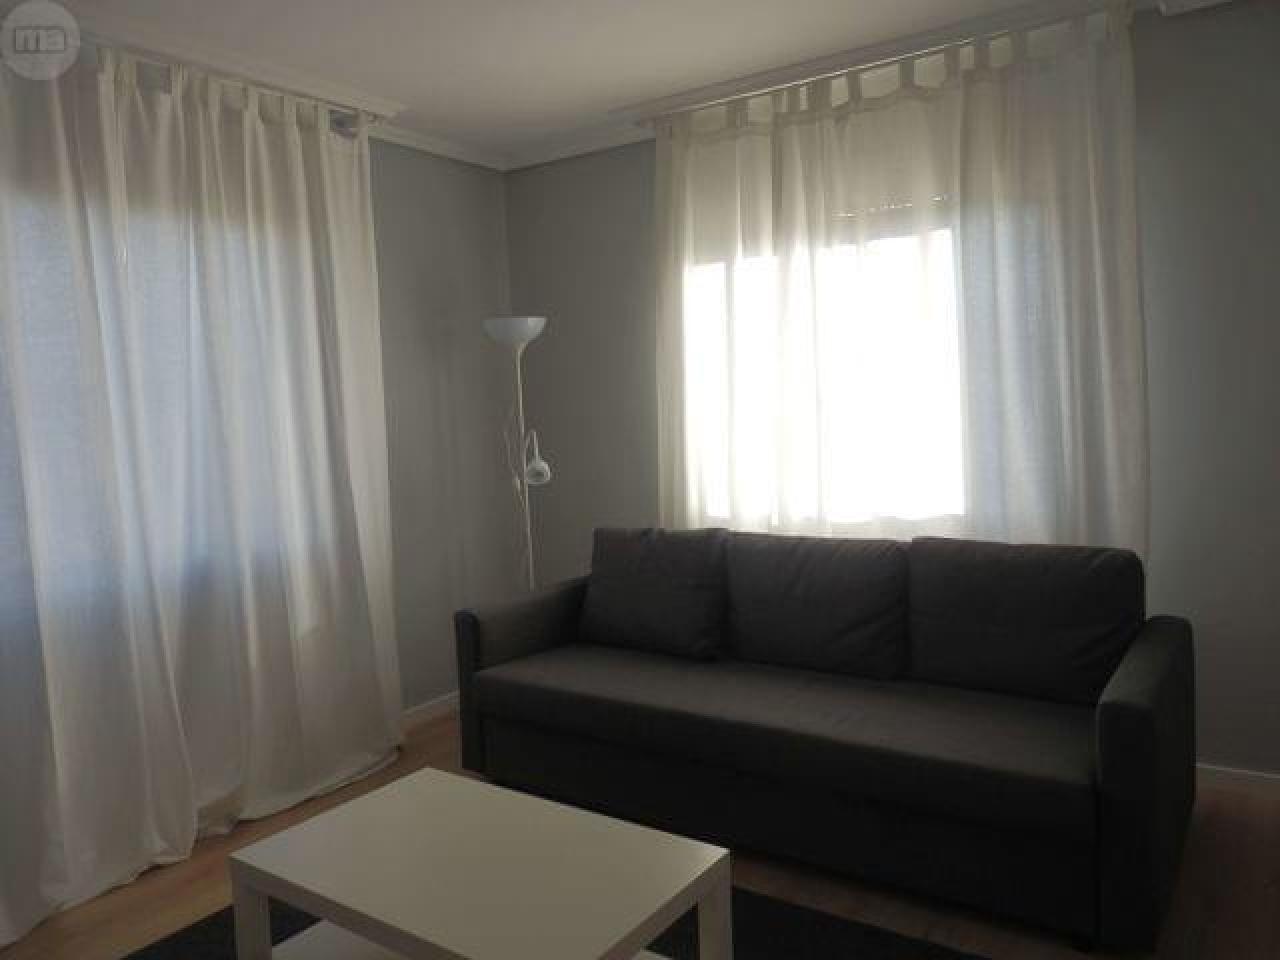 Alquiler de habitaciones Tui, Pontevedra